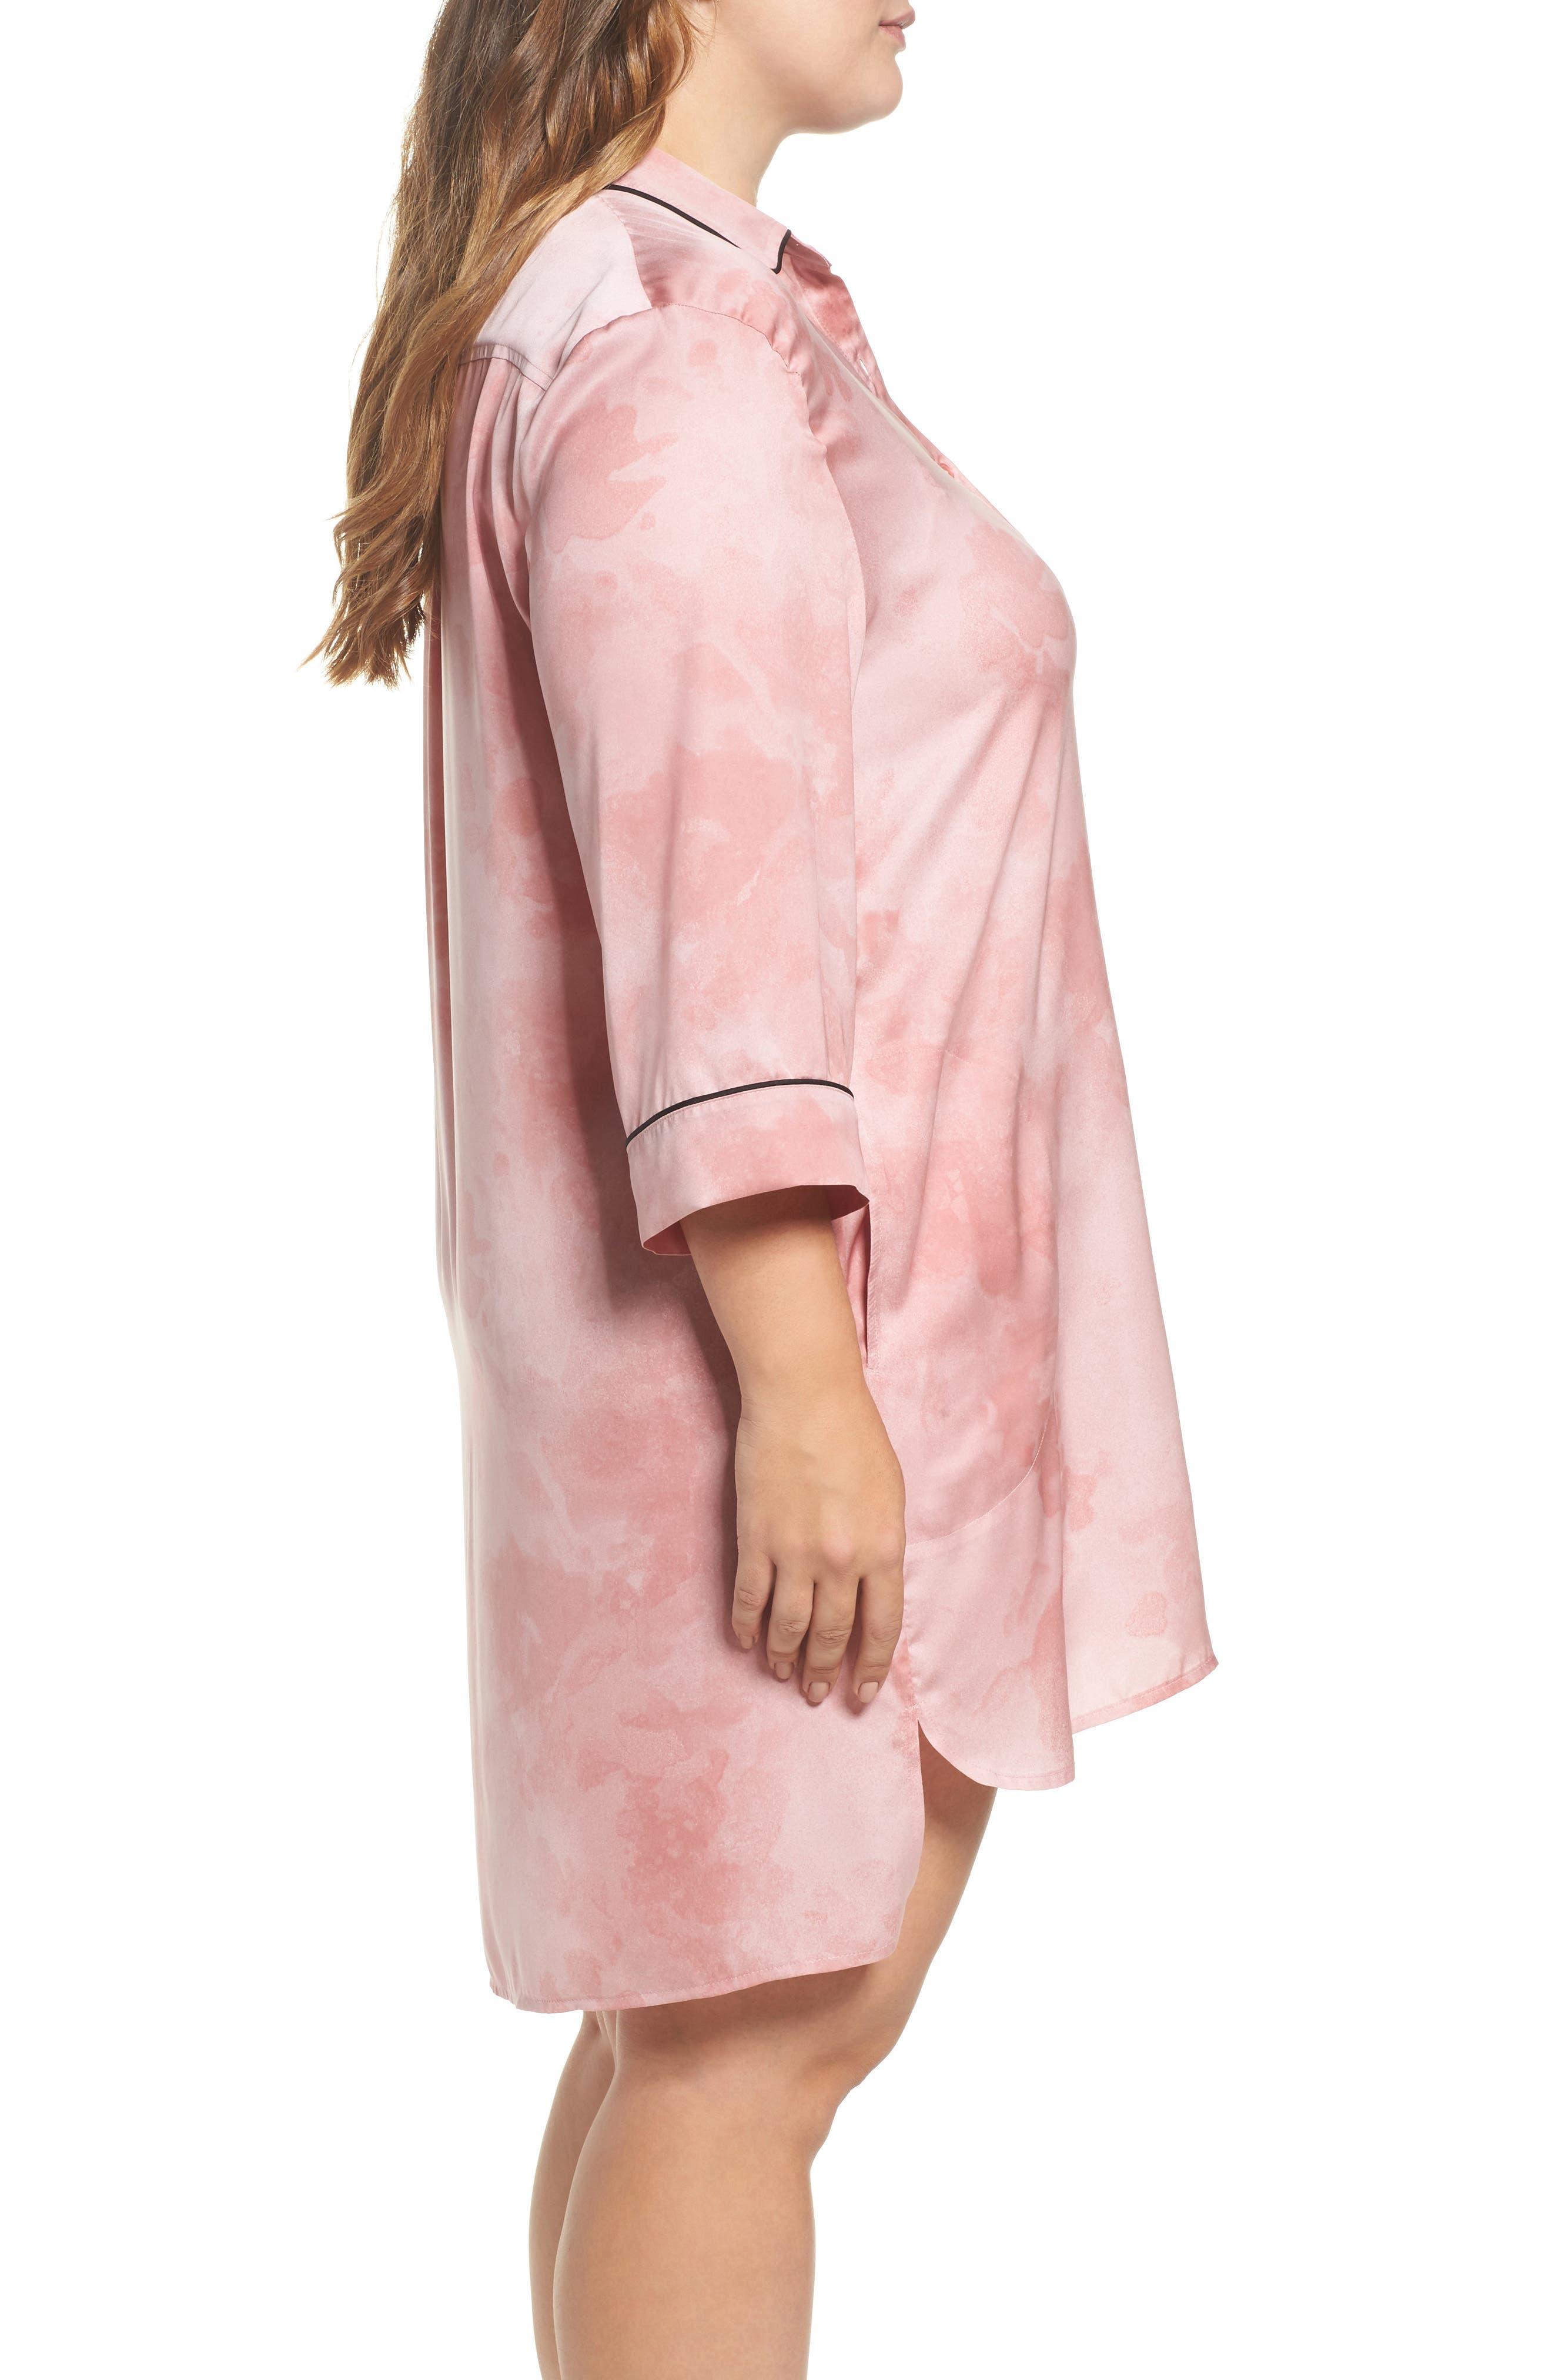 Washed Satin Sleep Shirt,                             Alternate thumbnail 3, color,                             Pink Floral